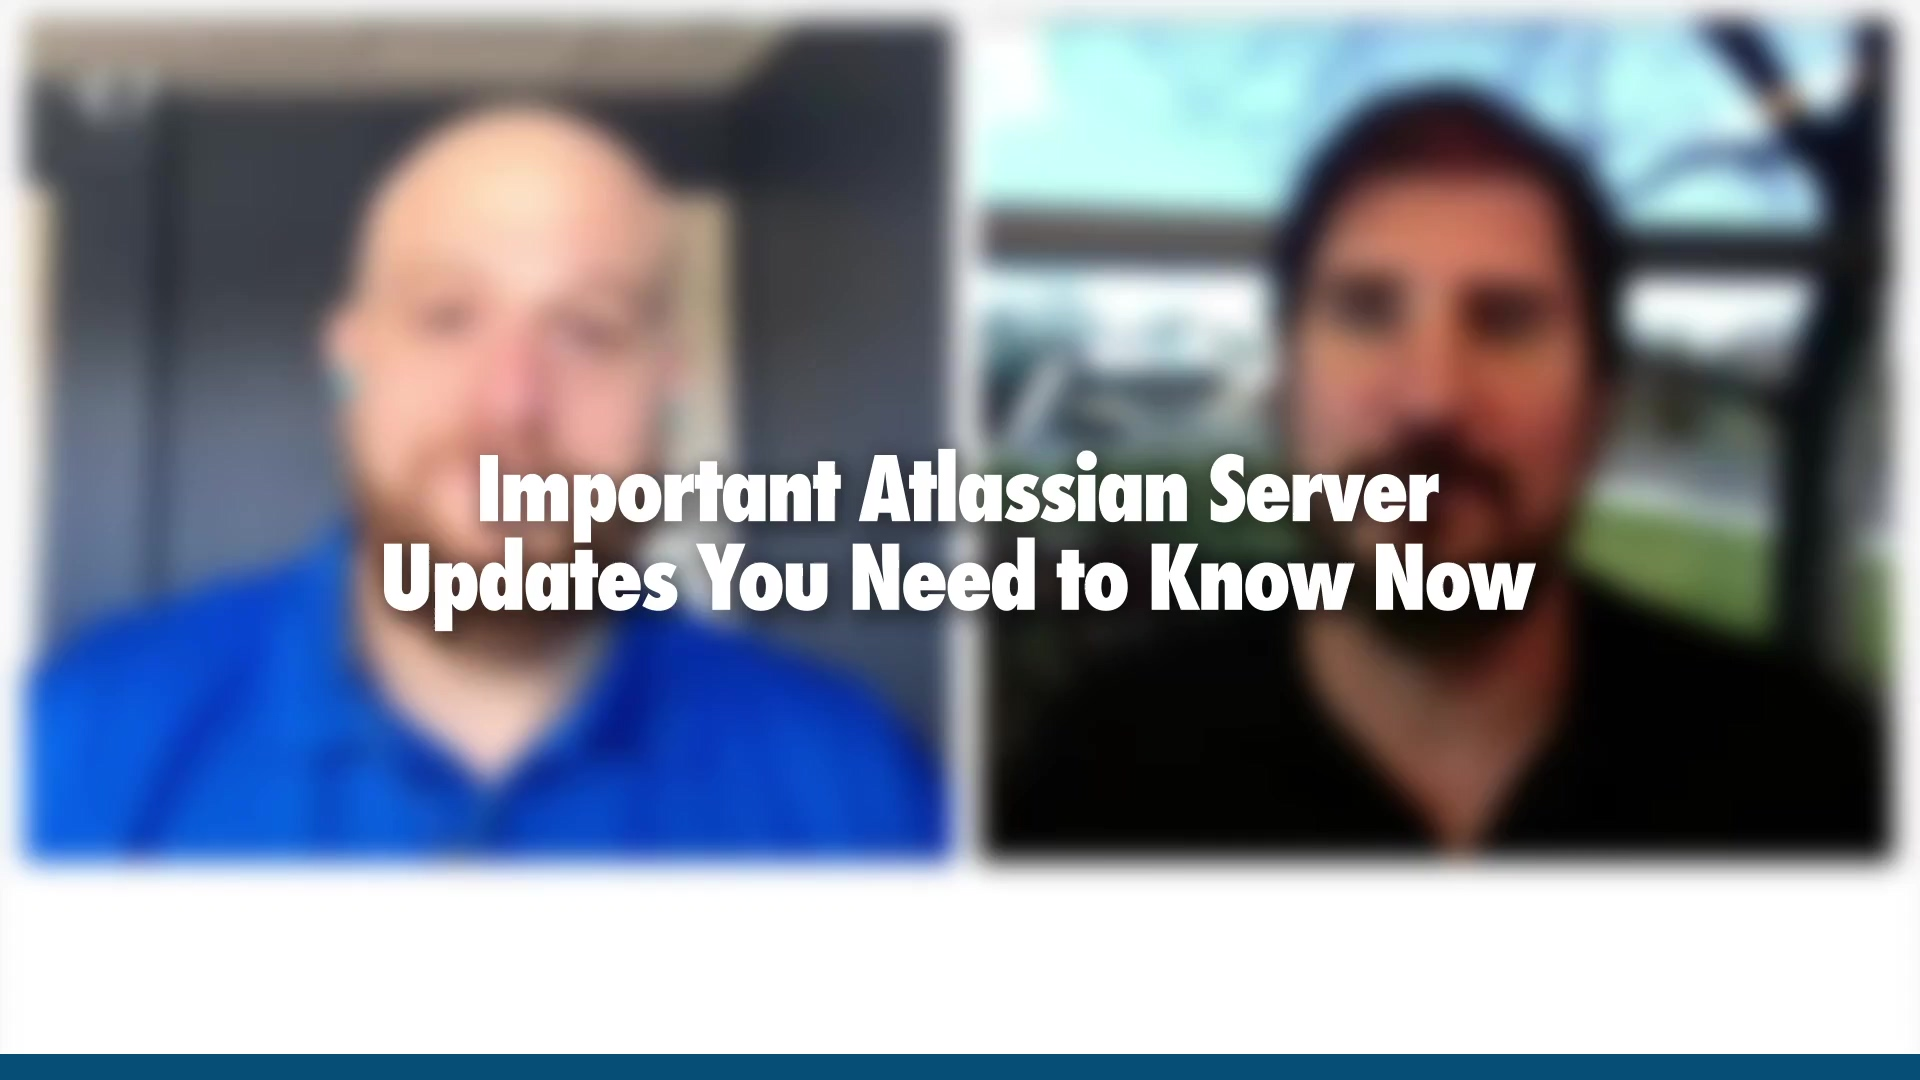 Edmond and Michael Atlassian Server Update